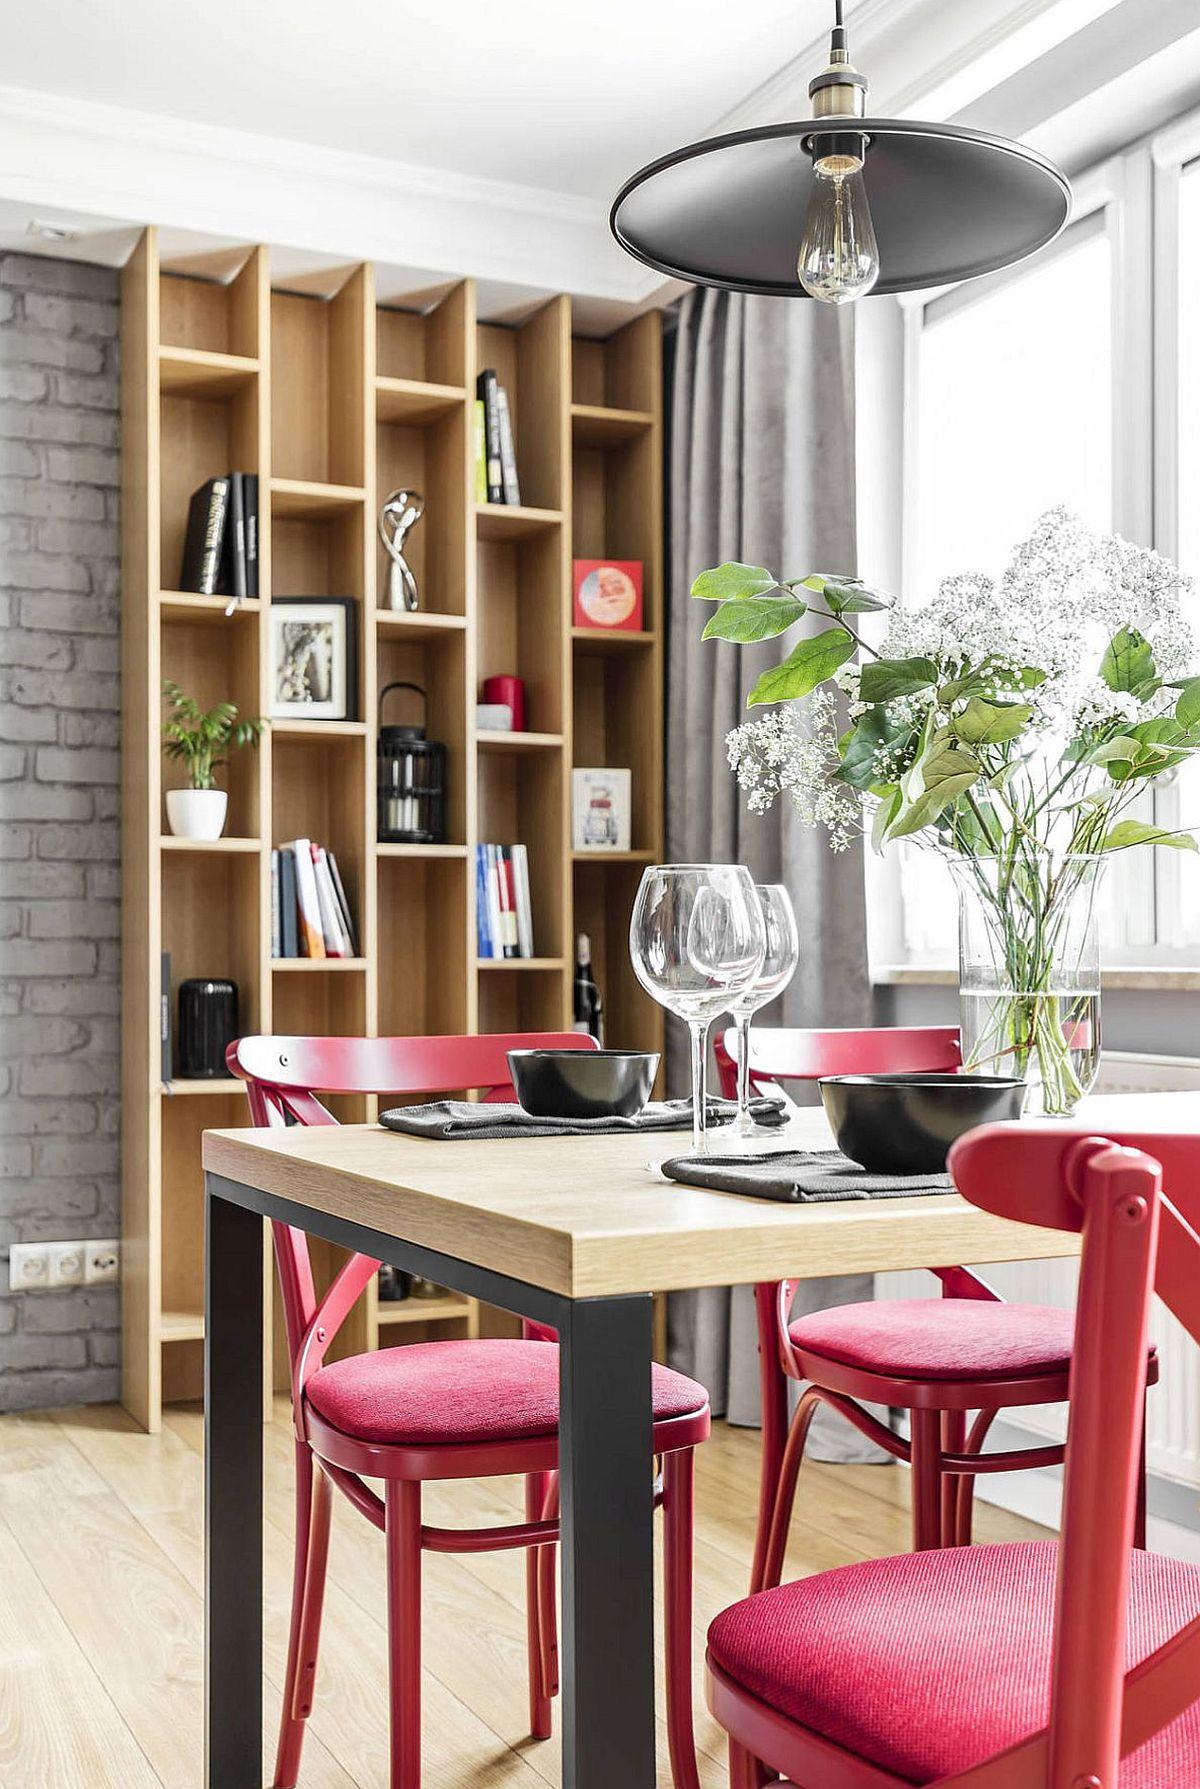 adelaparvu.com despre apartament 56 mp cu accente de rosu, design SAS Wnetrza i Kuchnie, Foto Strazynski Studio (7)